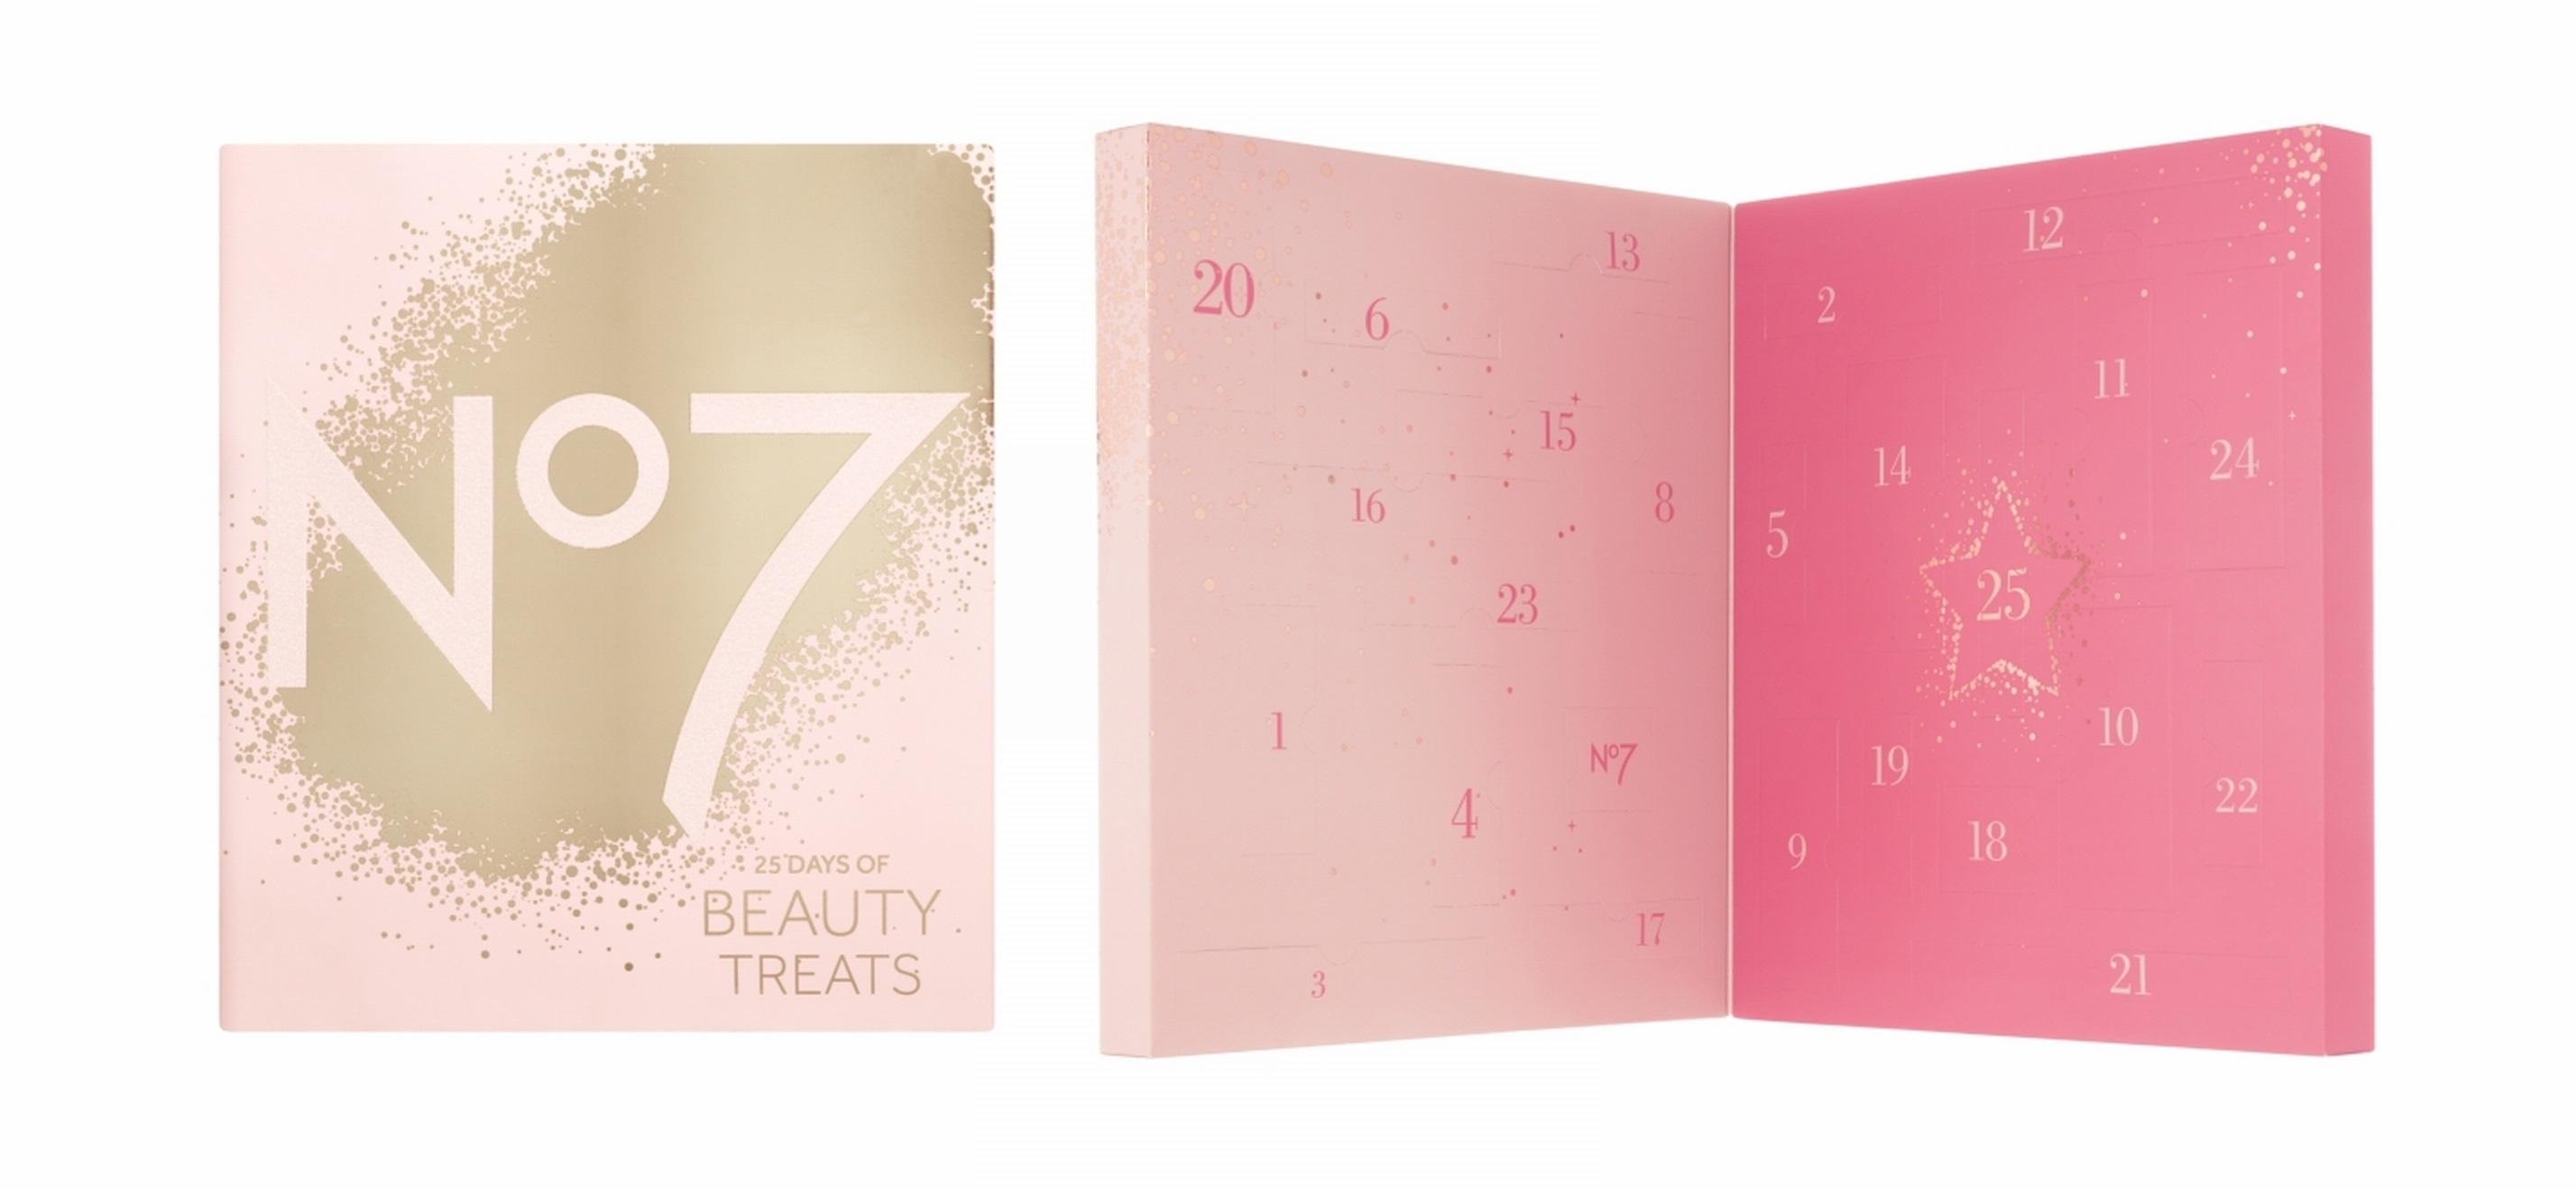 Boots No7 Beauty Calendar 2017 Review